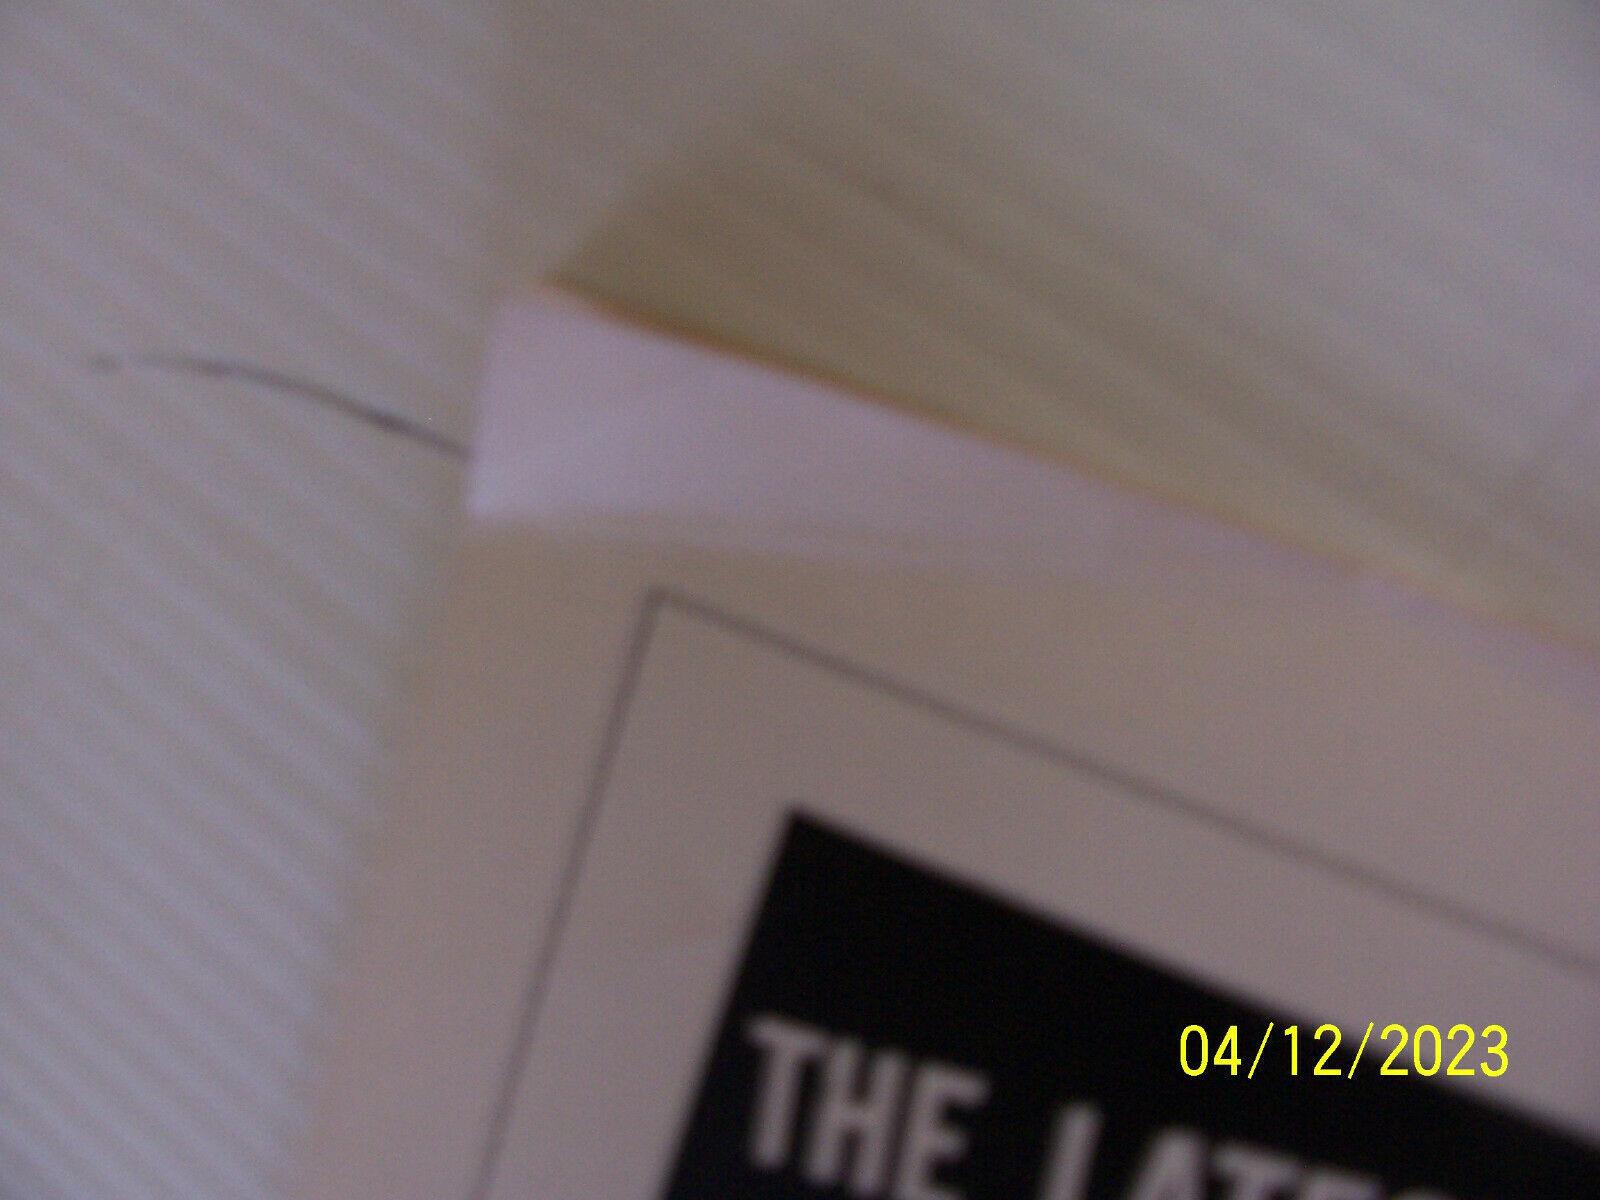 Item image 9